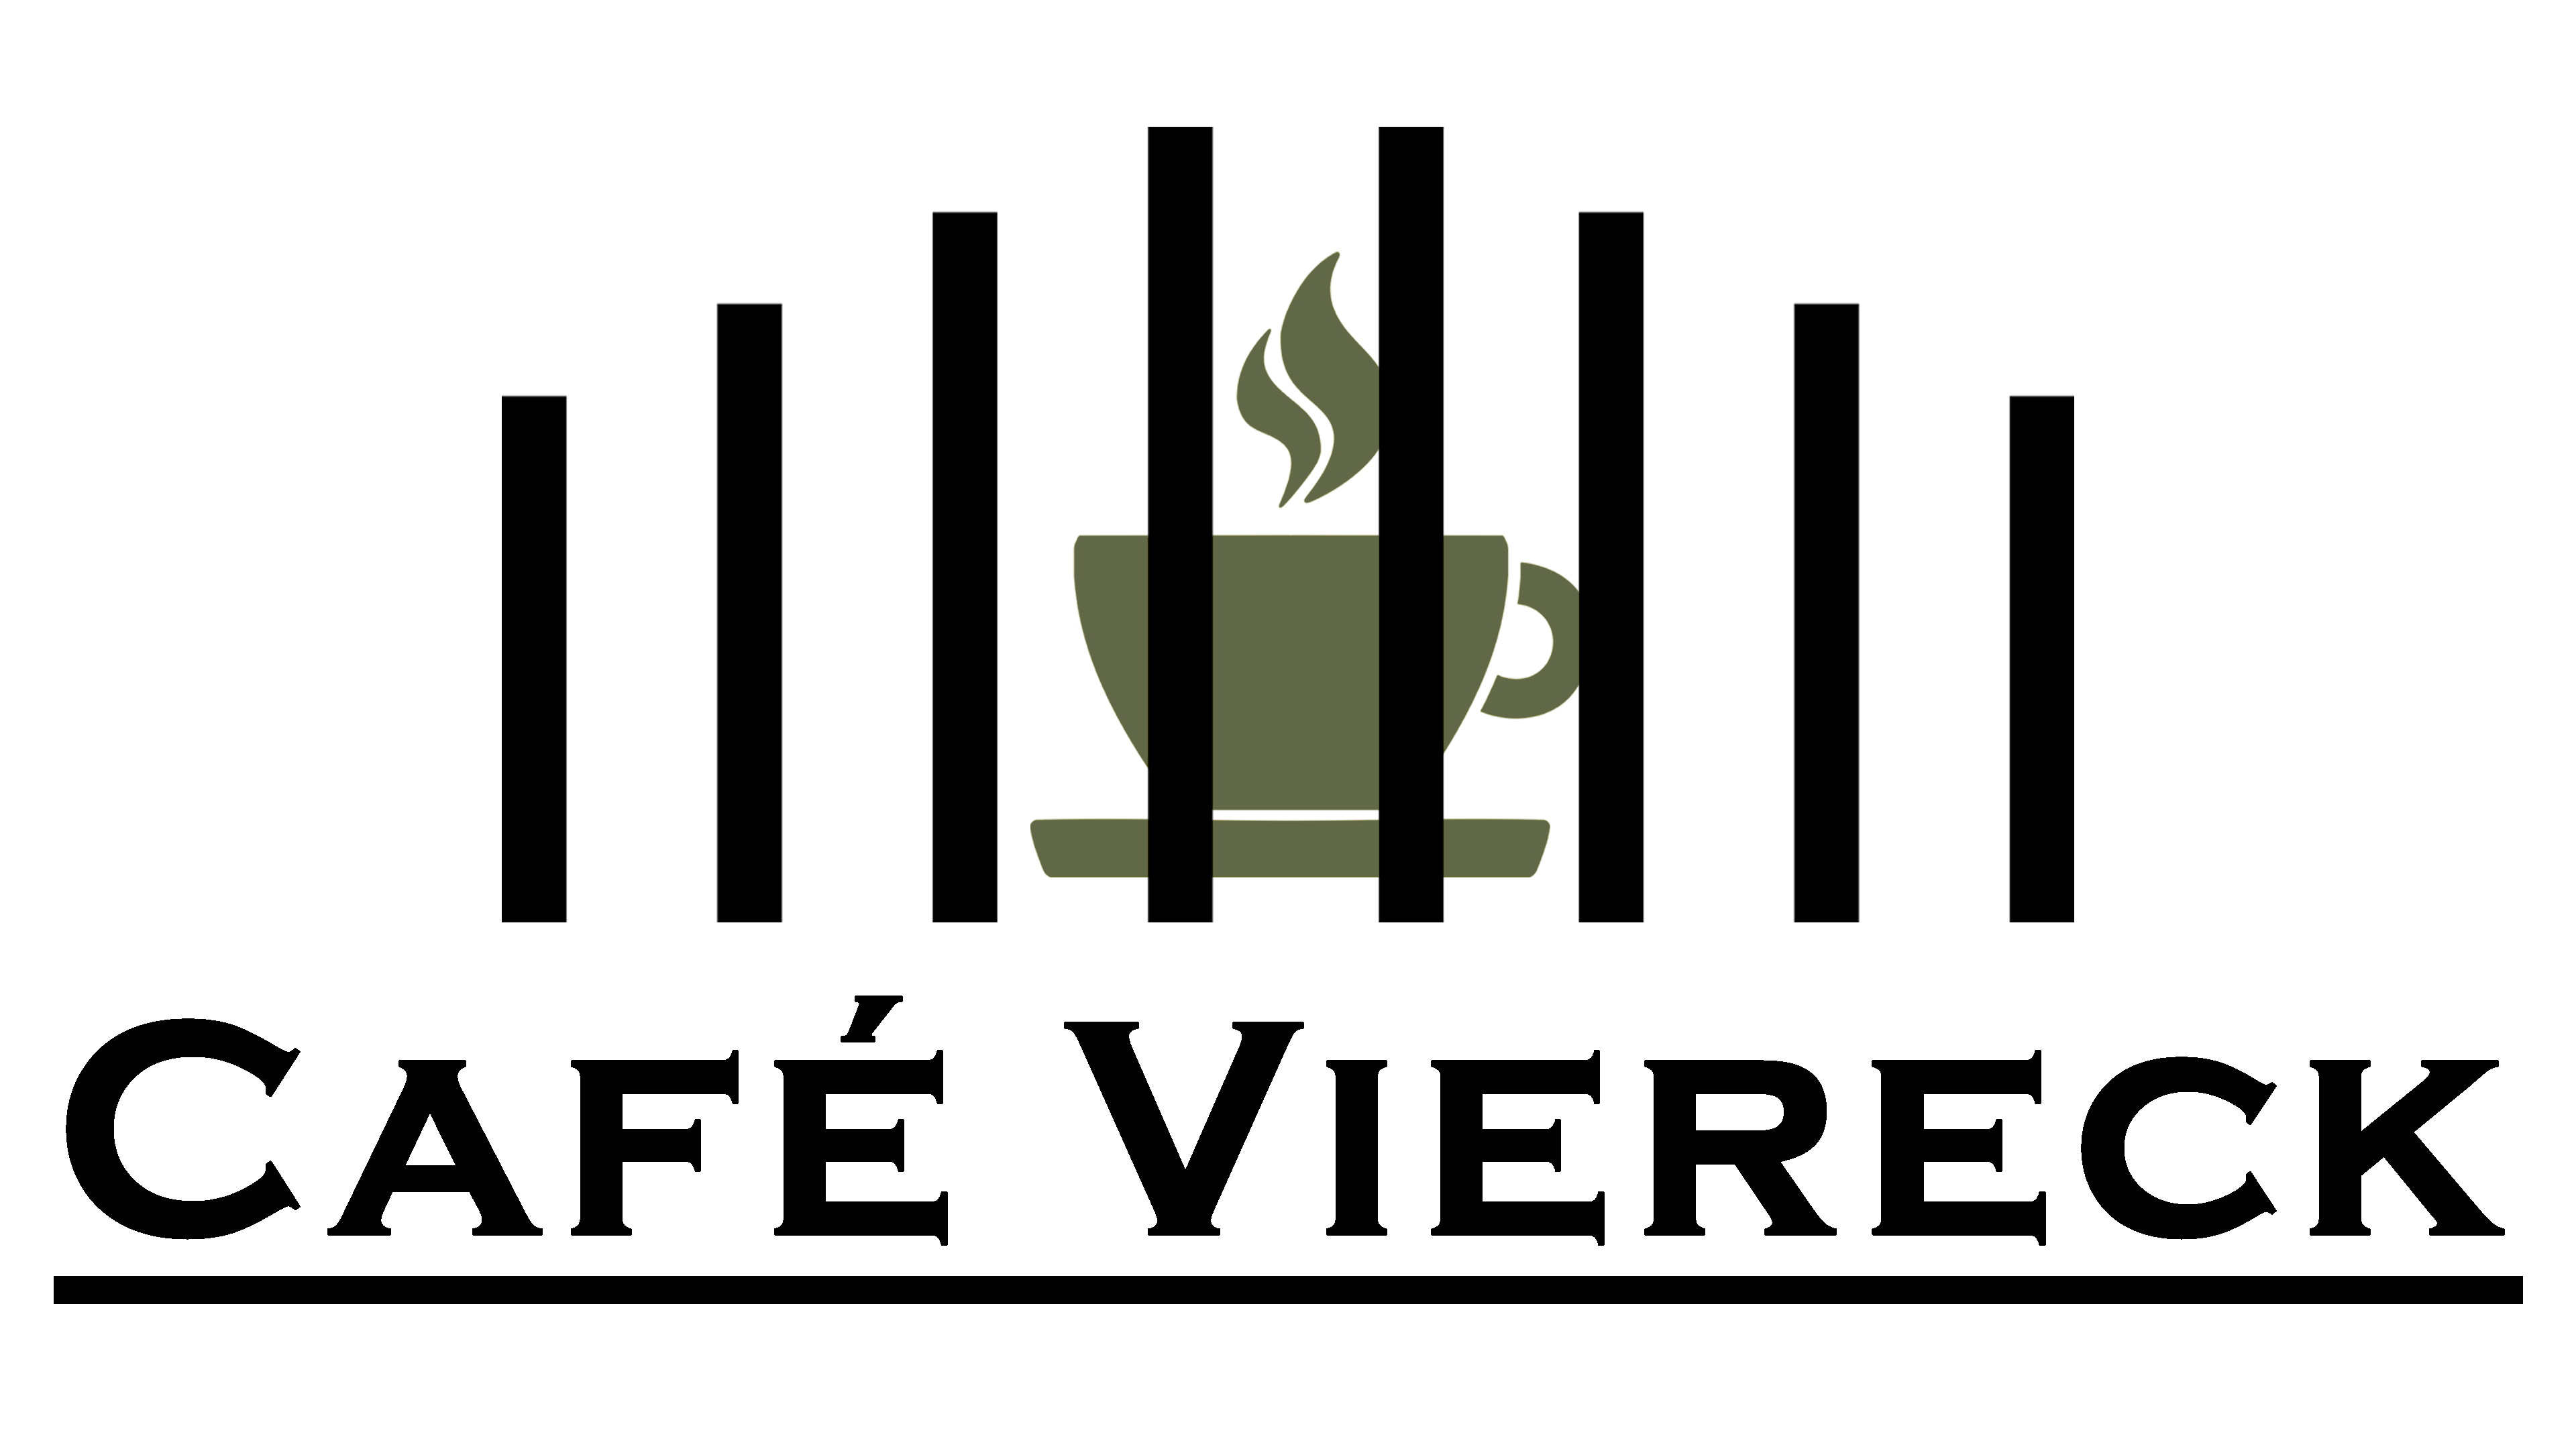 Café Viereck